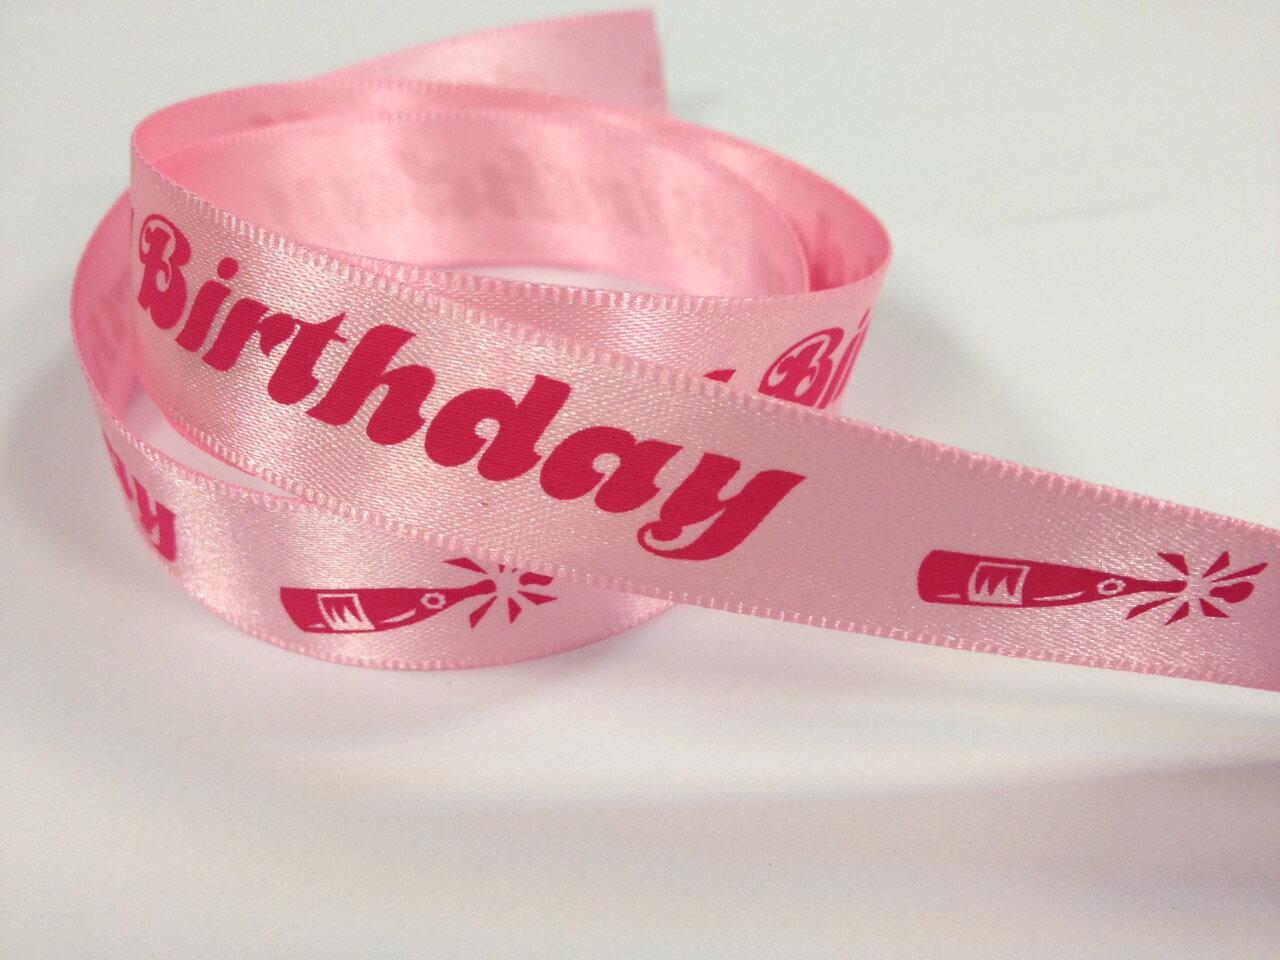 【Crystal Rose緞帶專賣店】雙面緞生日快樂-汽水瓶 2